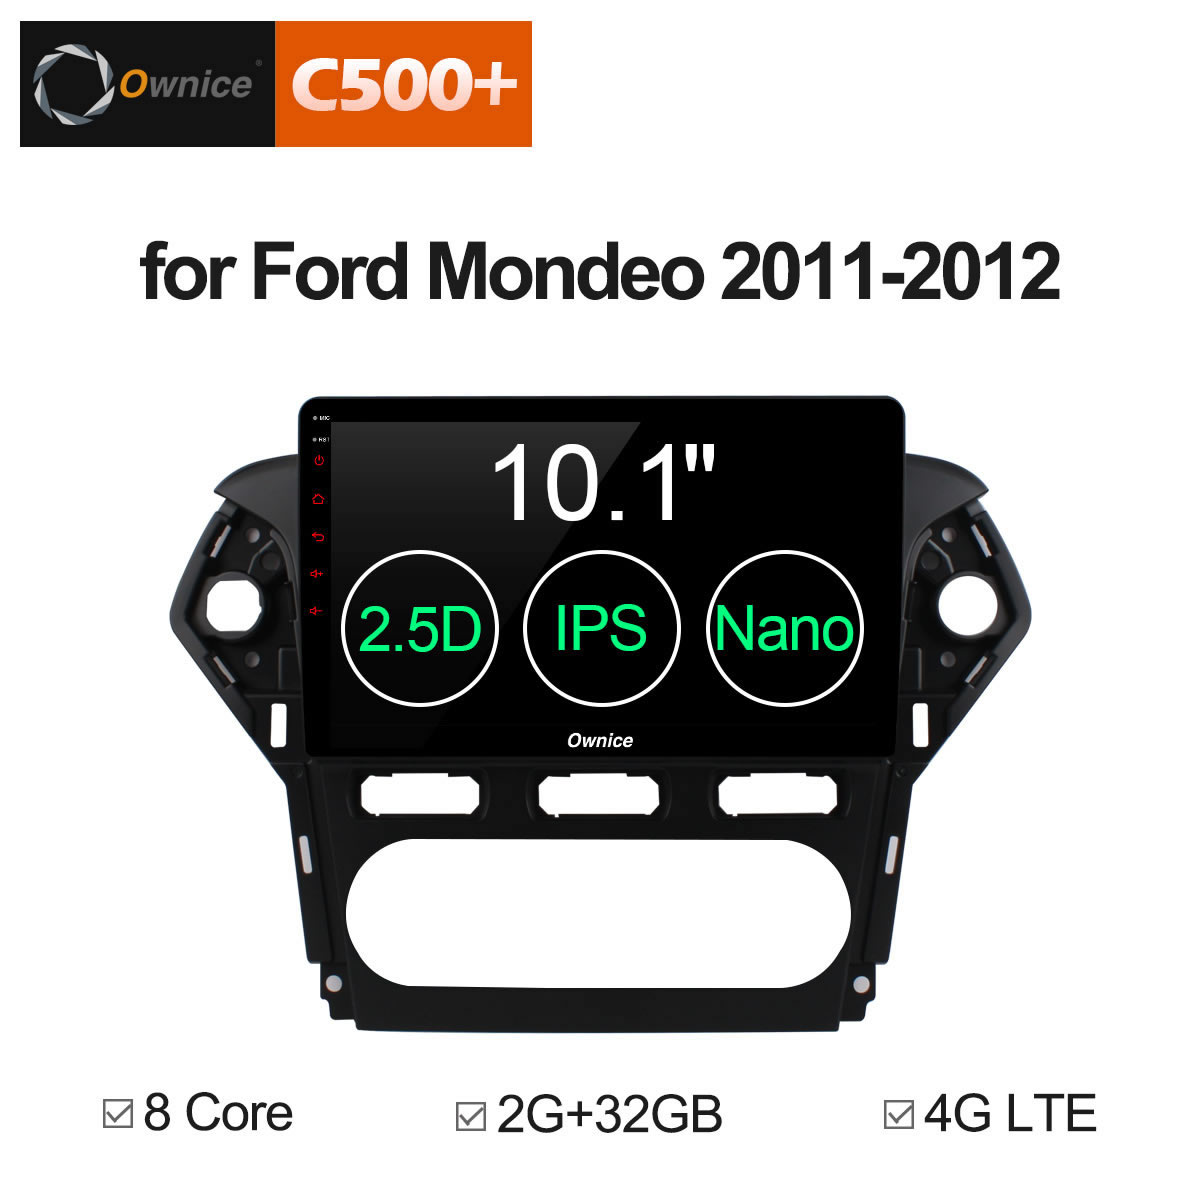 Ownice C500 + G10 10.1 Android 8.1 Octa Core autoradio pour Ford Mondeo 2011 2012 GPS Audio dvd prise en Charge Du lecteur 32g ROM 4g LTE DVR